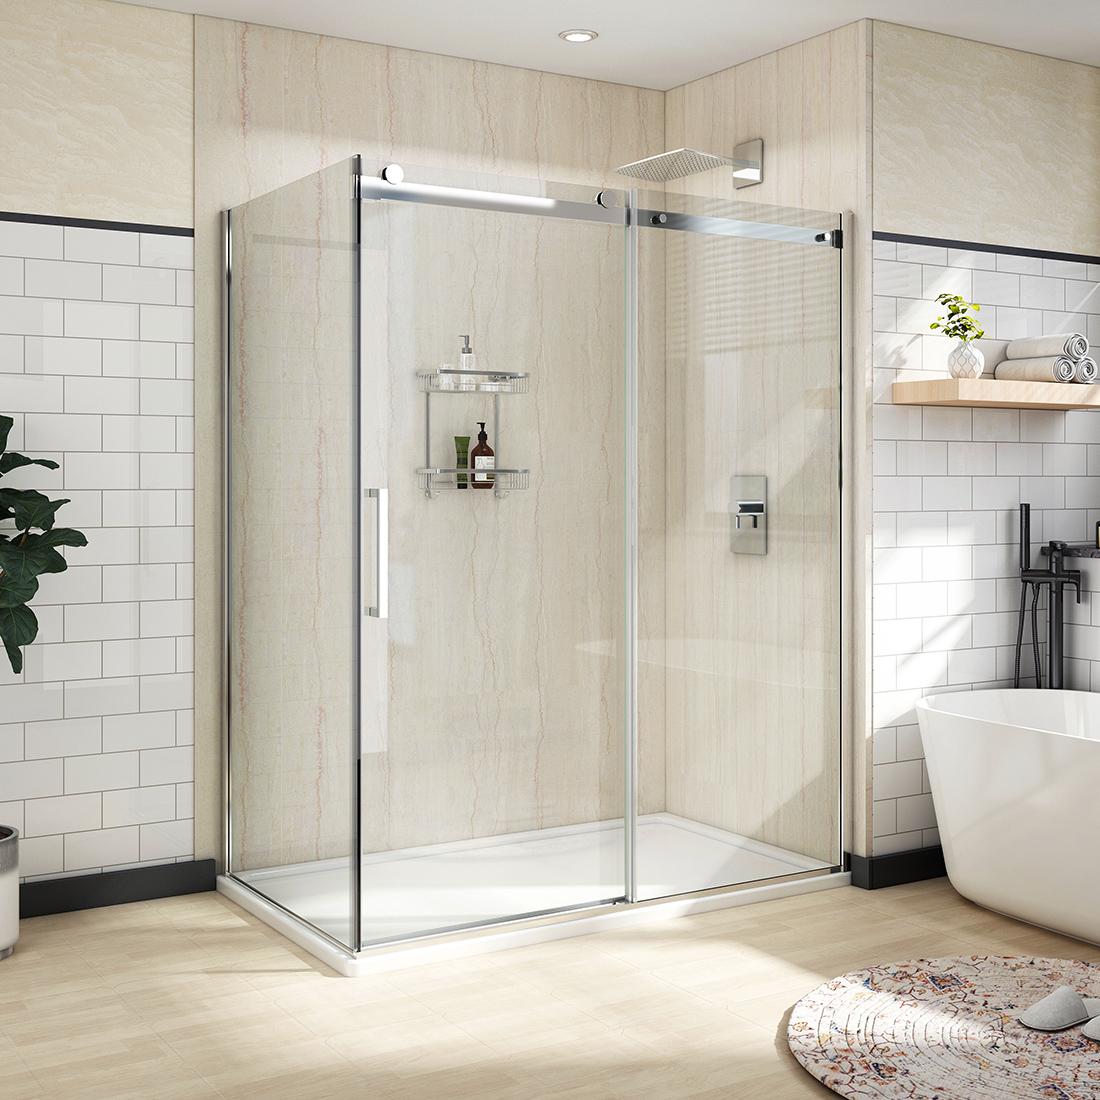 Details About 60 X36 X72 Bath Frameless Sliding Shower Door Enclosure 5 16 Glass Chrome